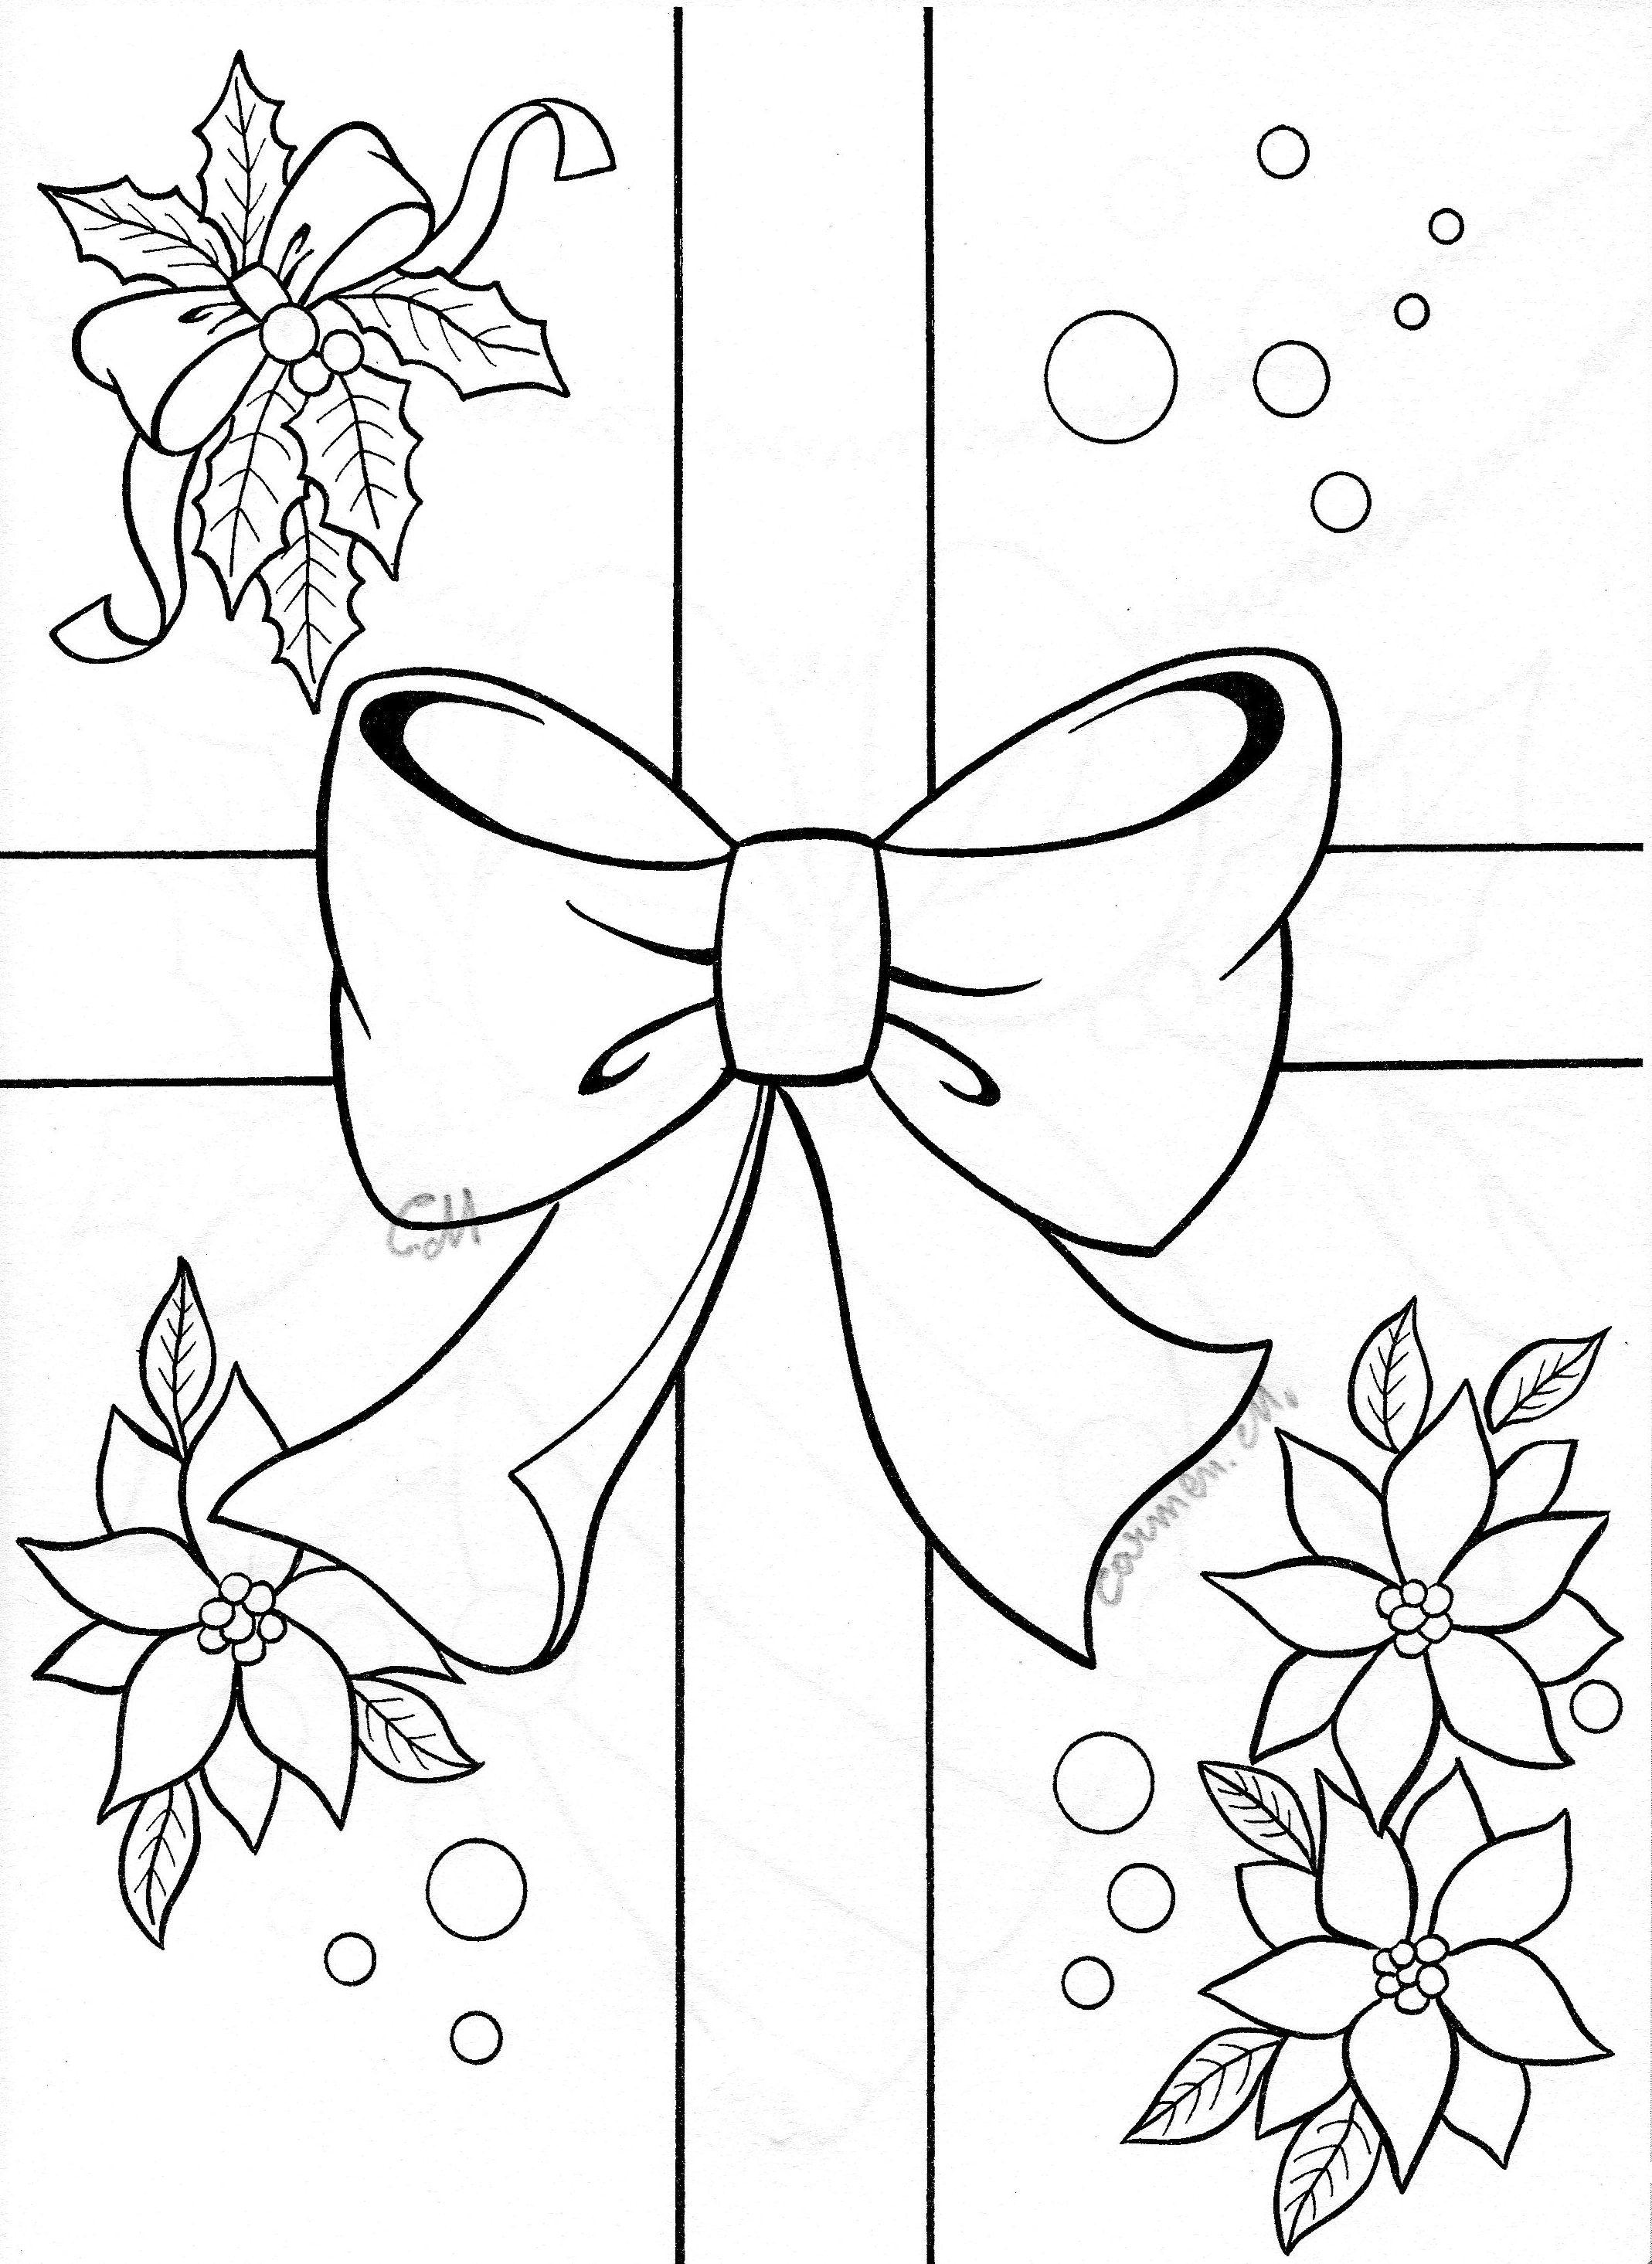 Pin de angela en Proyectos que intentar | Pinterest | Pergamino ...